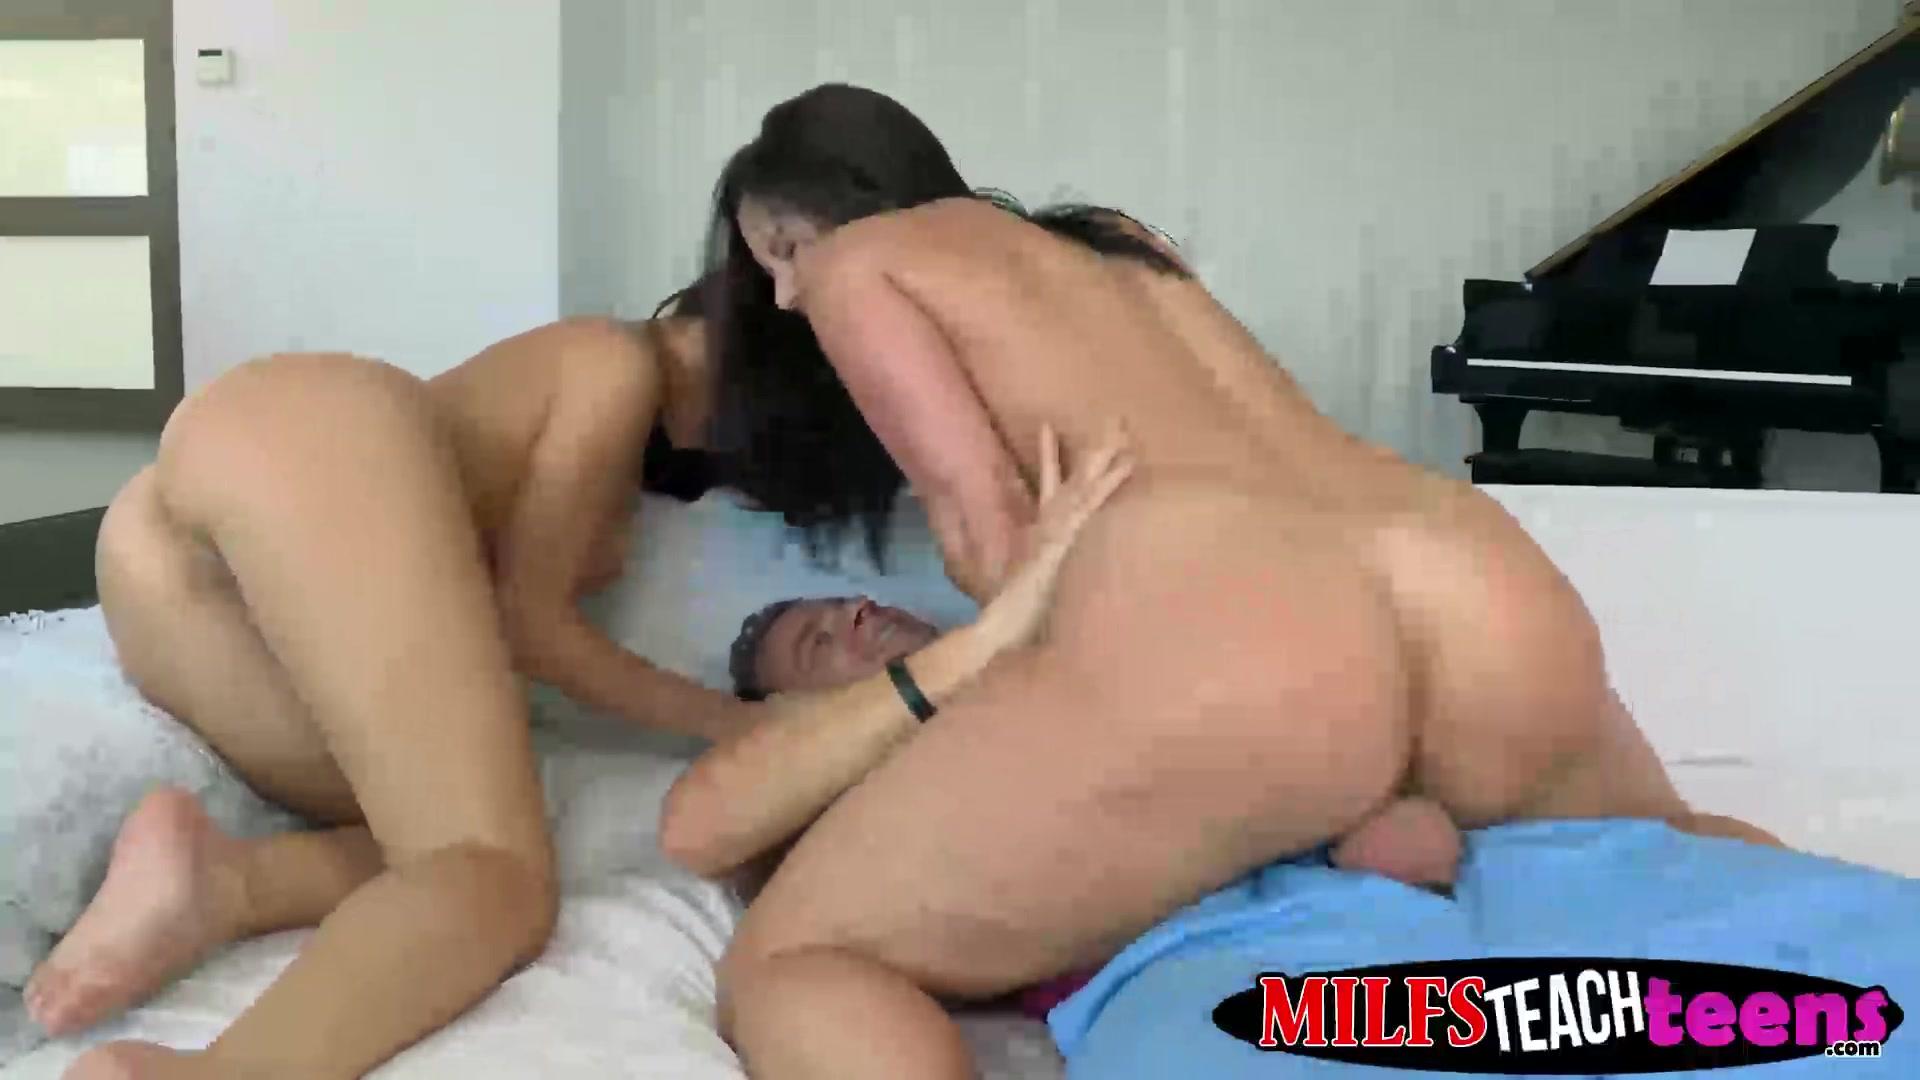 Porn archive 30a bra sexy